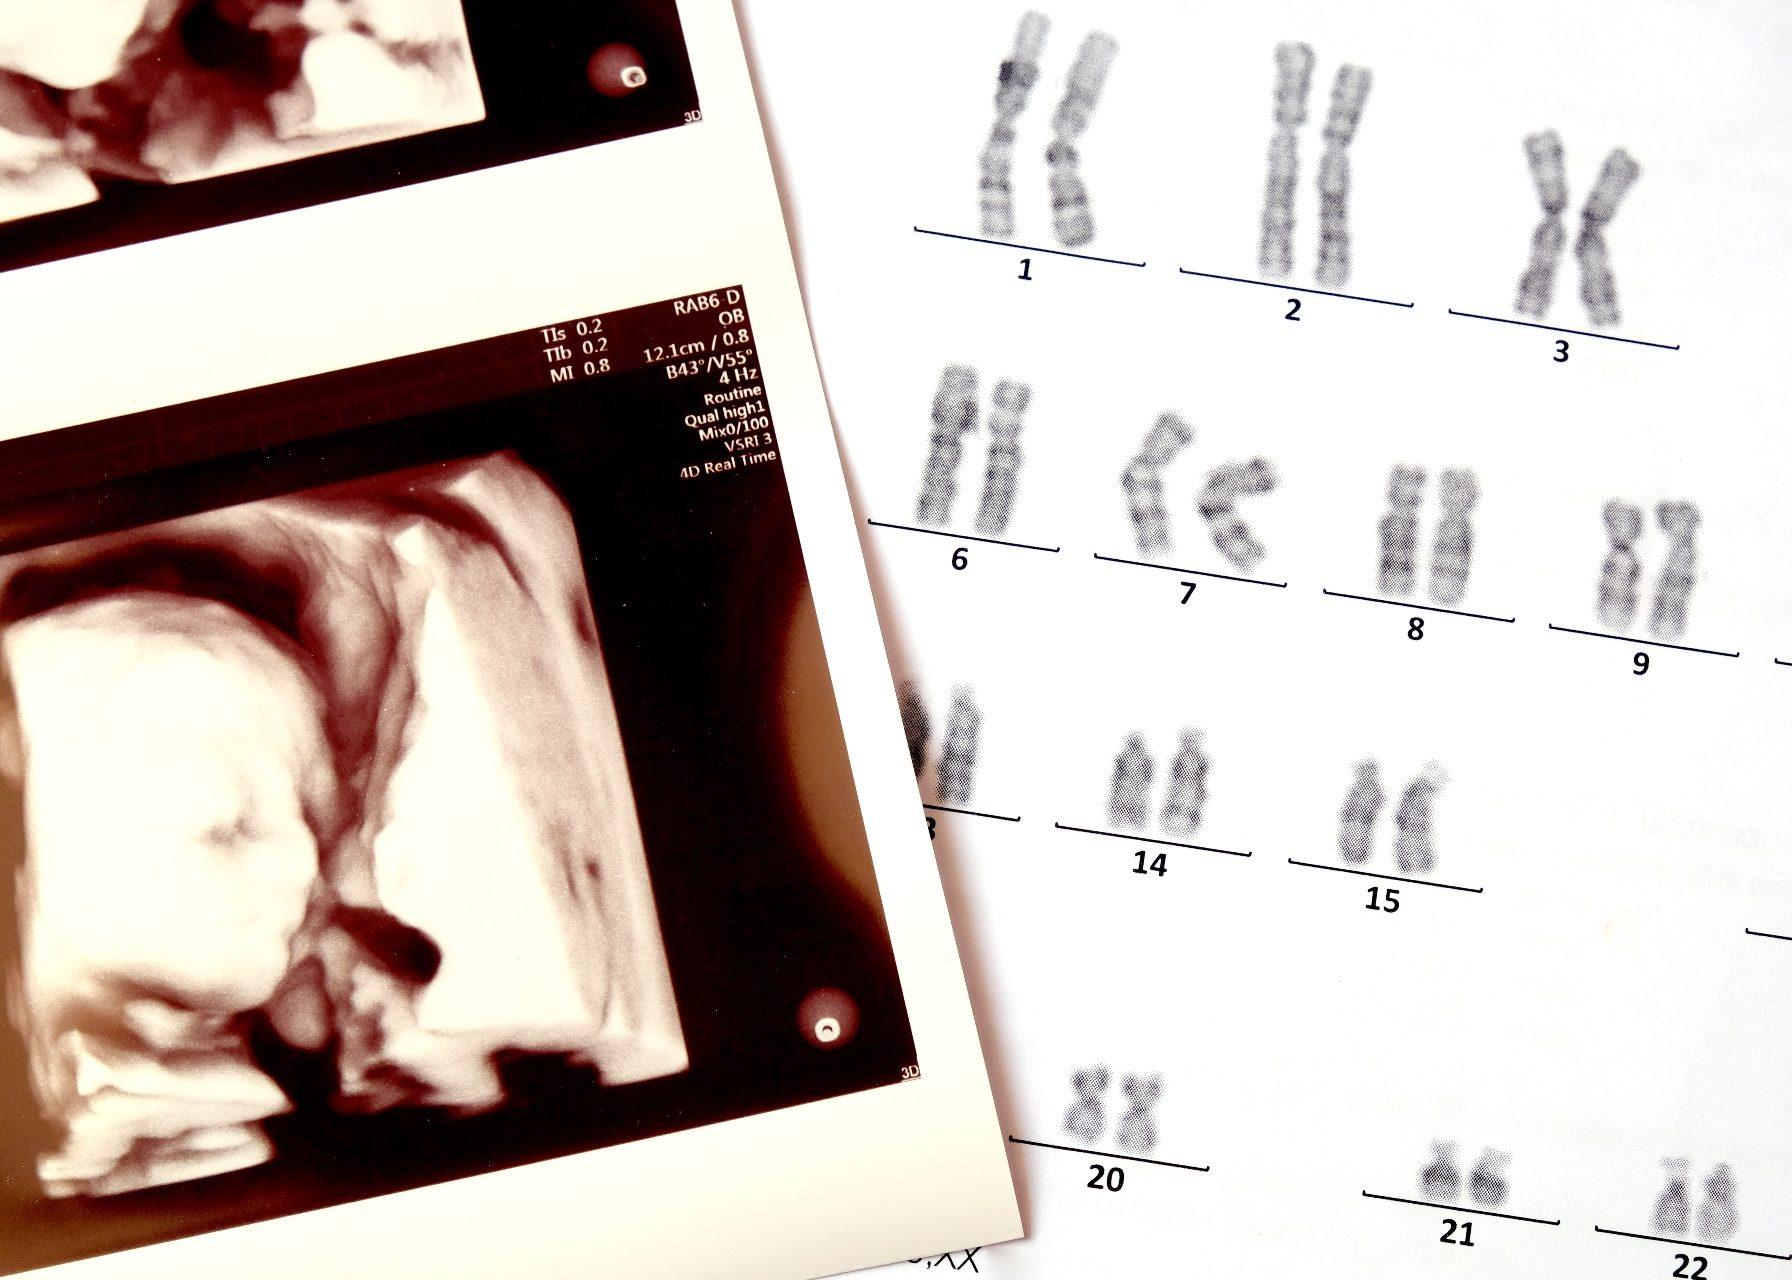 Trissomia cariótipo banda g alterado down edwards patau síndrome